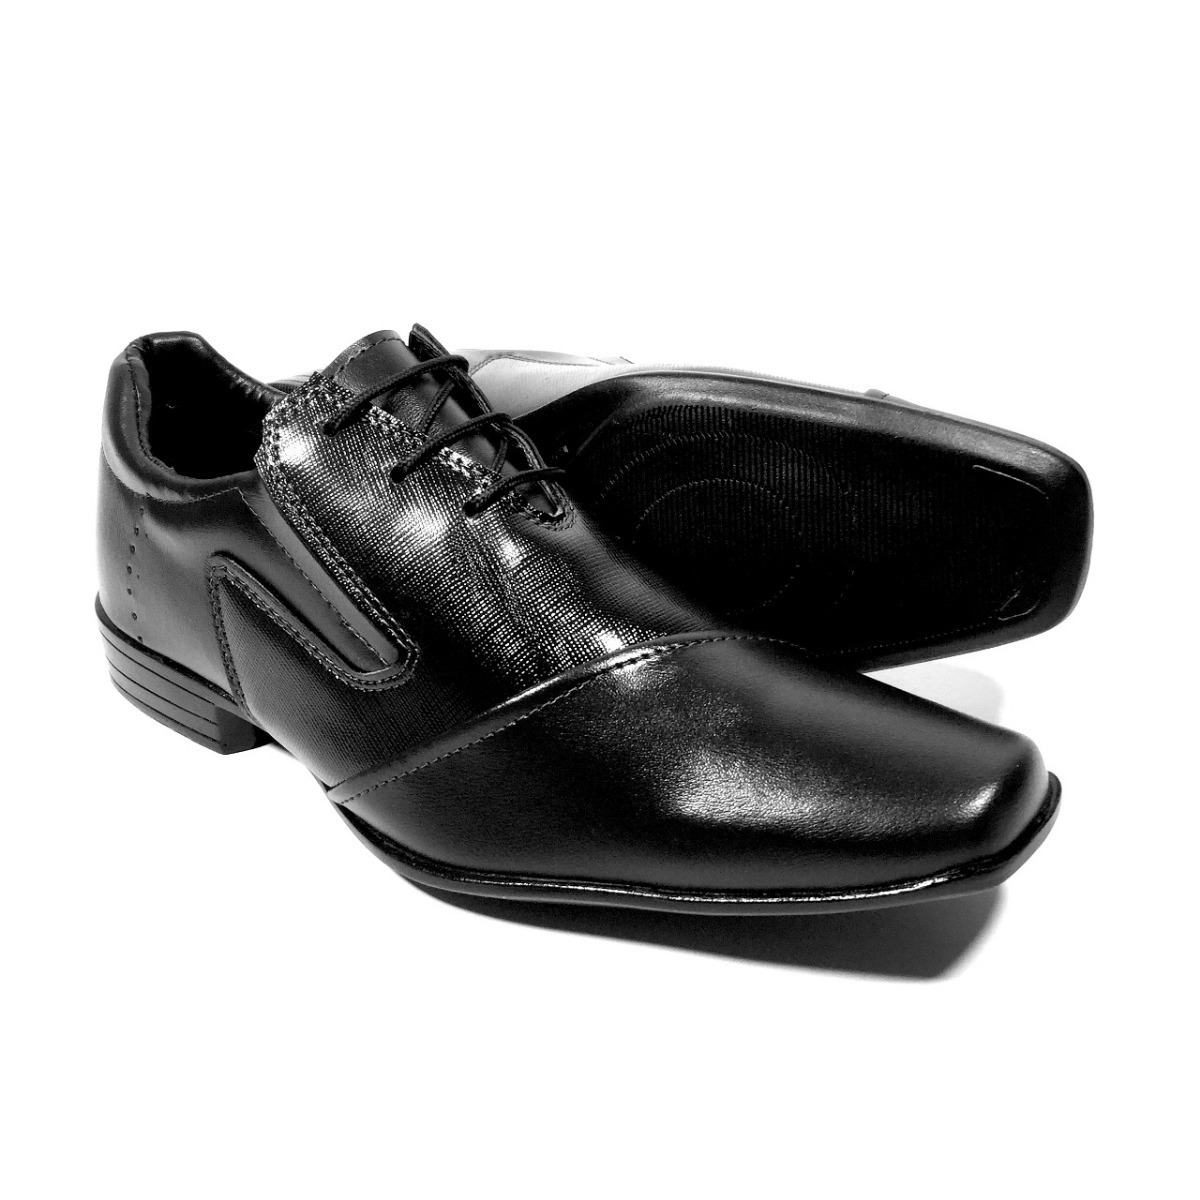 868c50588 calçados sapato franca tenis amarrar social casual festa top. Carregando  zoom.